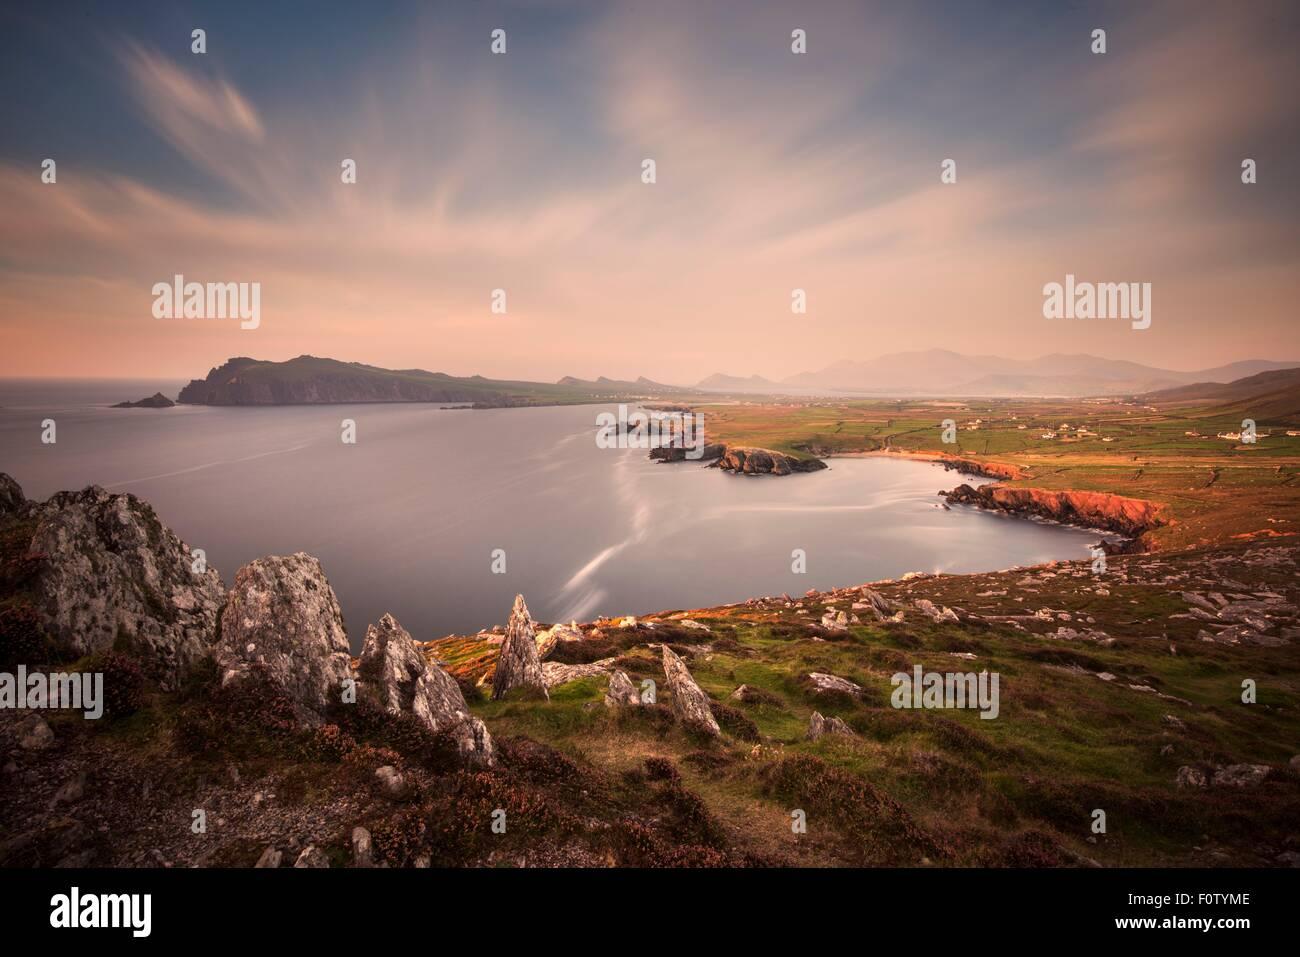 Seashore of Dingle Peninsula, County Kerry, Ireland - Stock Image